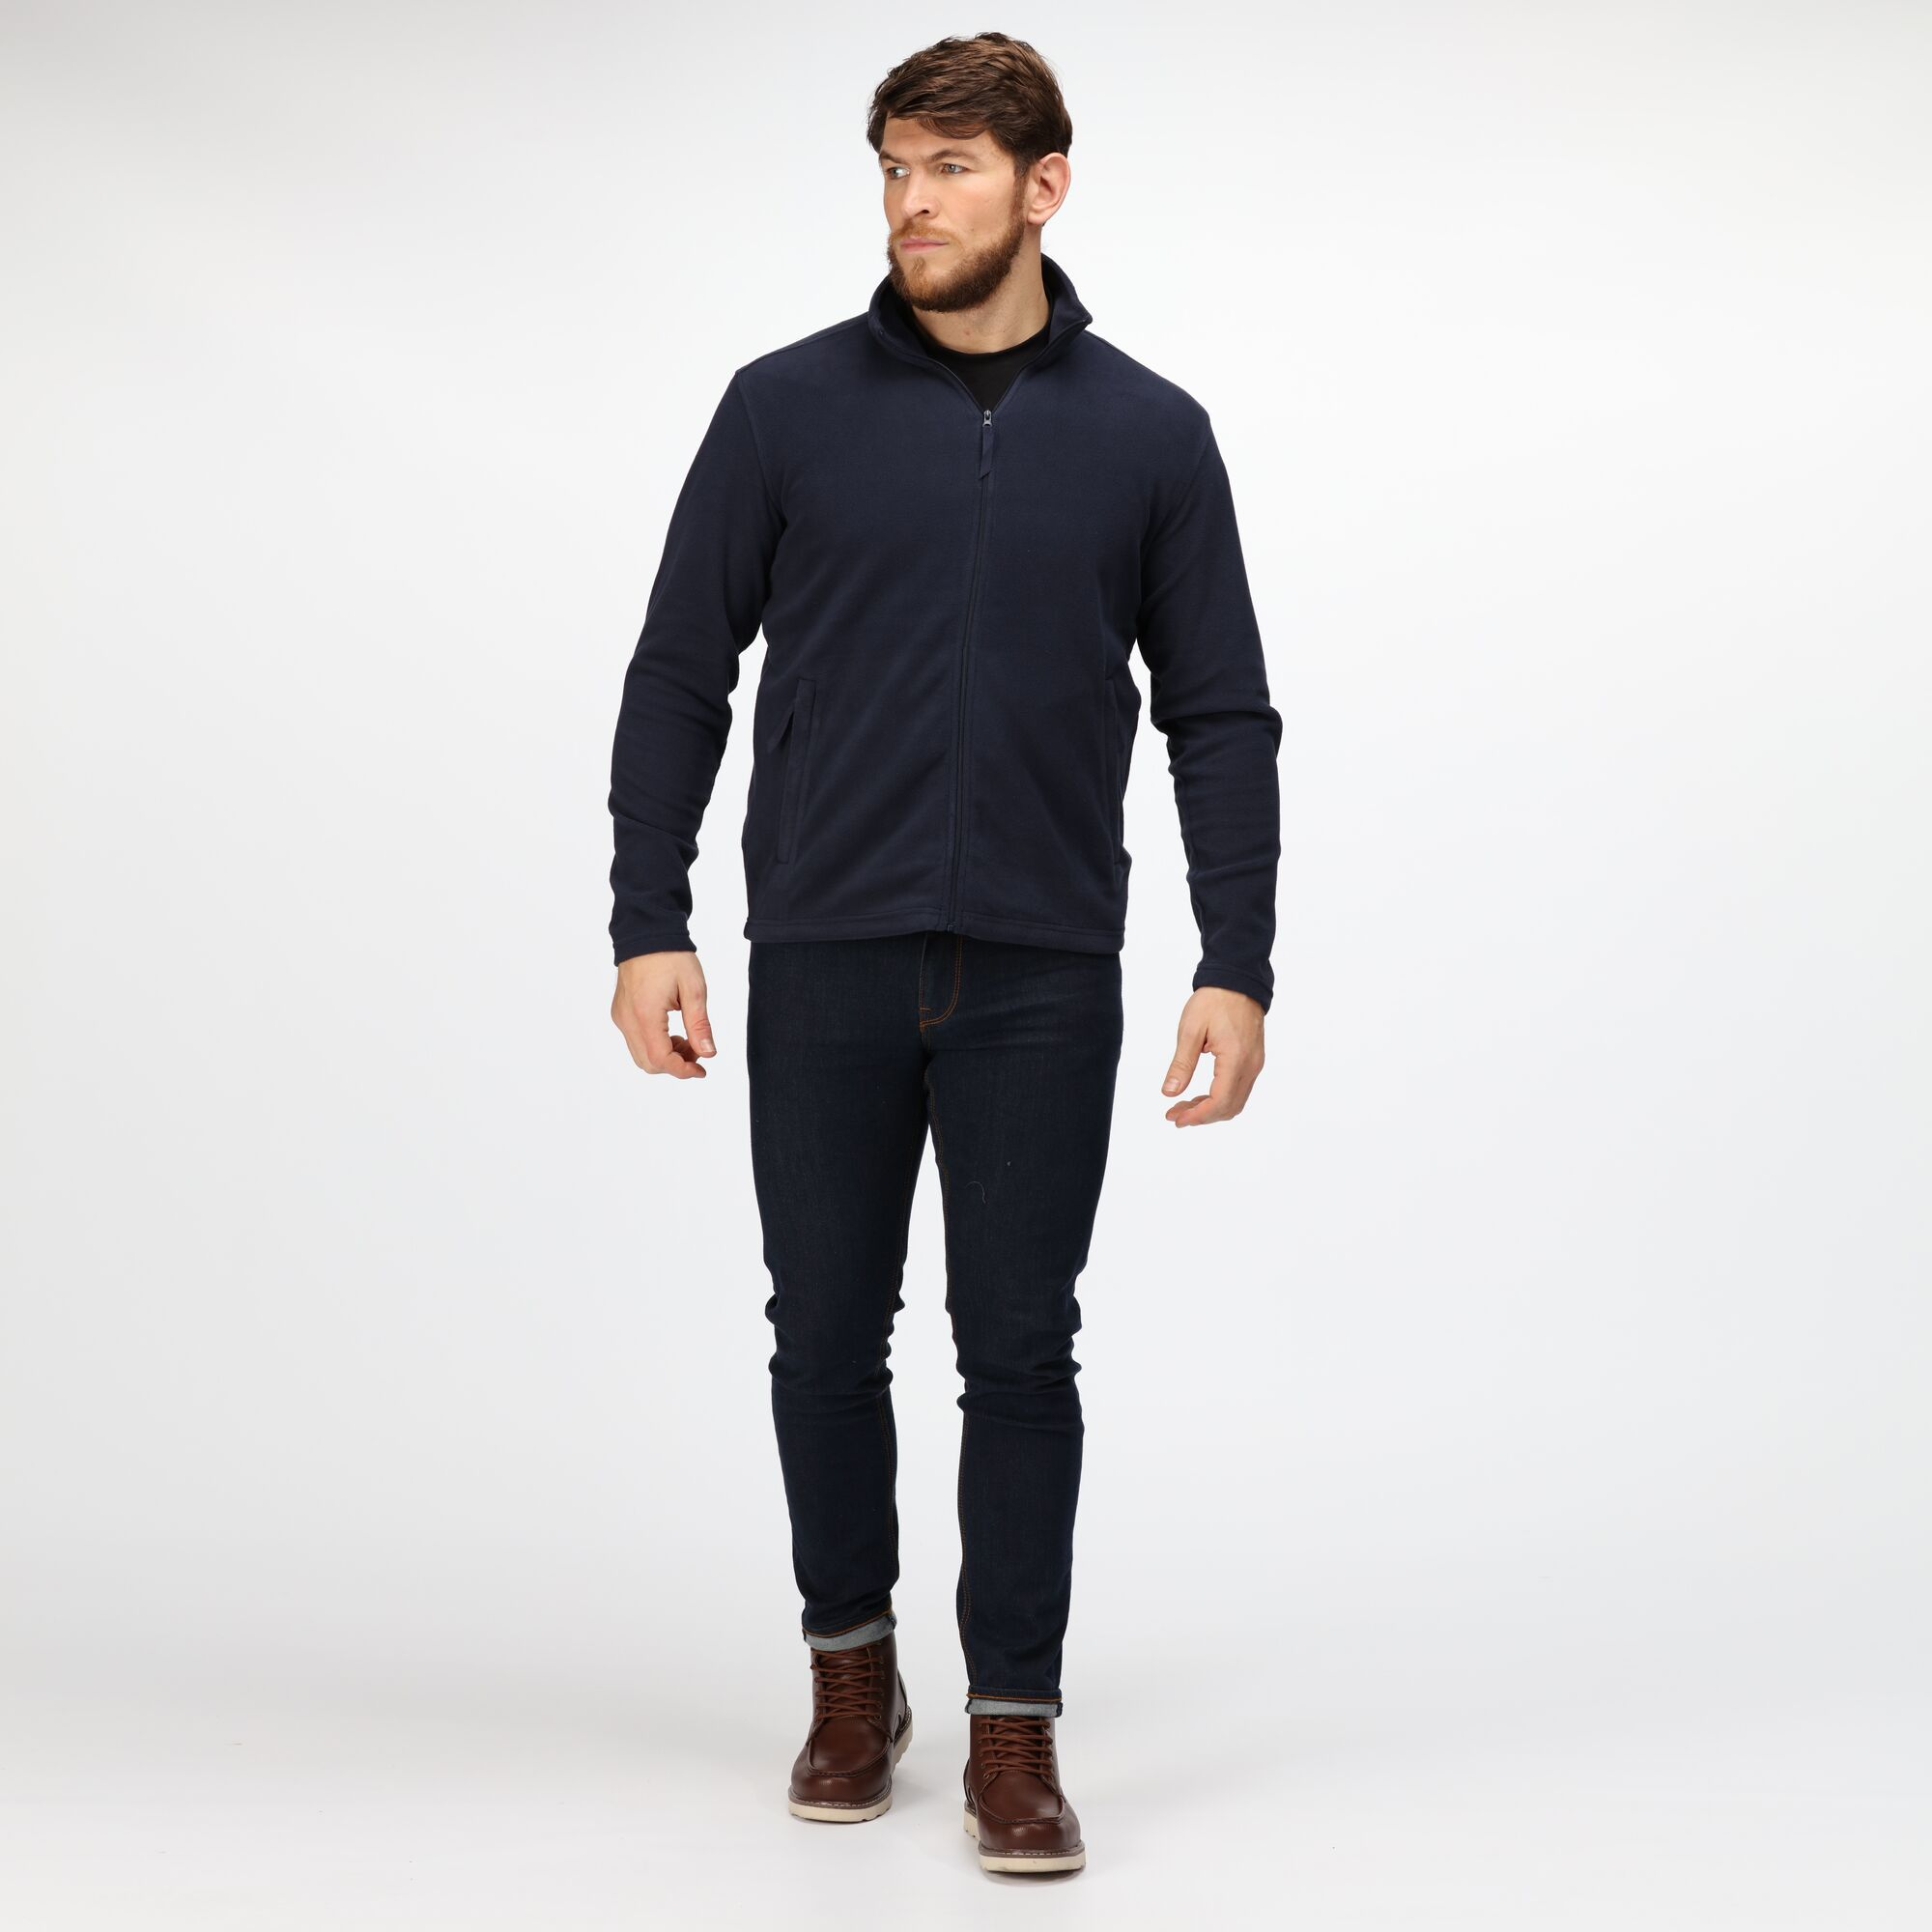 Regatta Professional Mens Classic Micro Fleece Jacket (S) (Dark Navy)